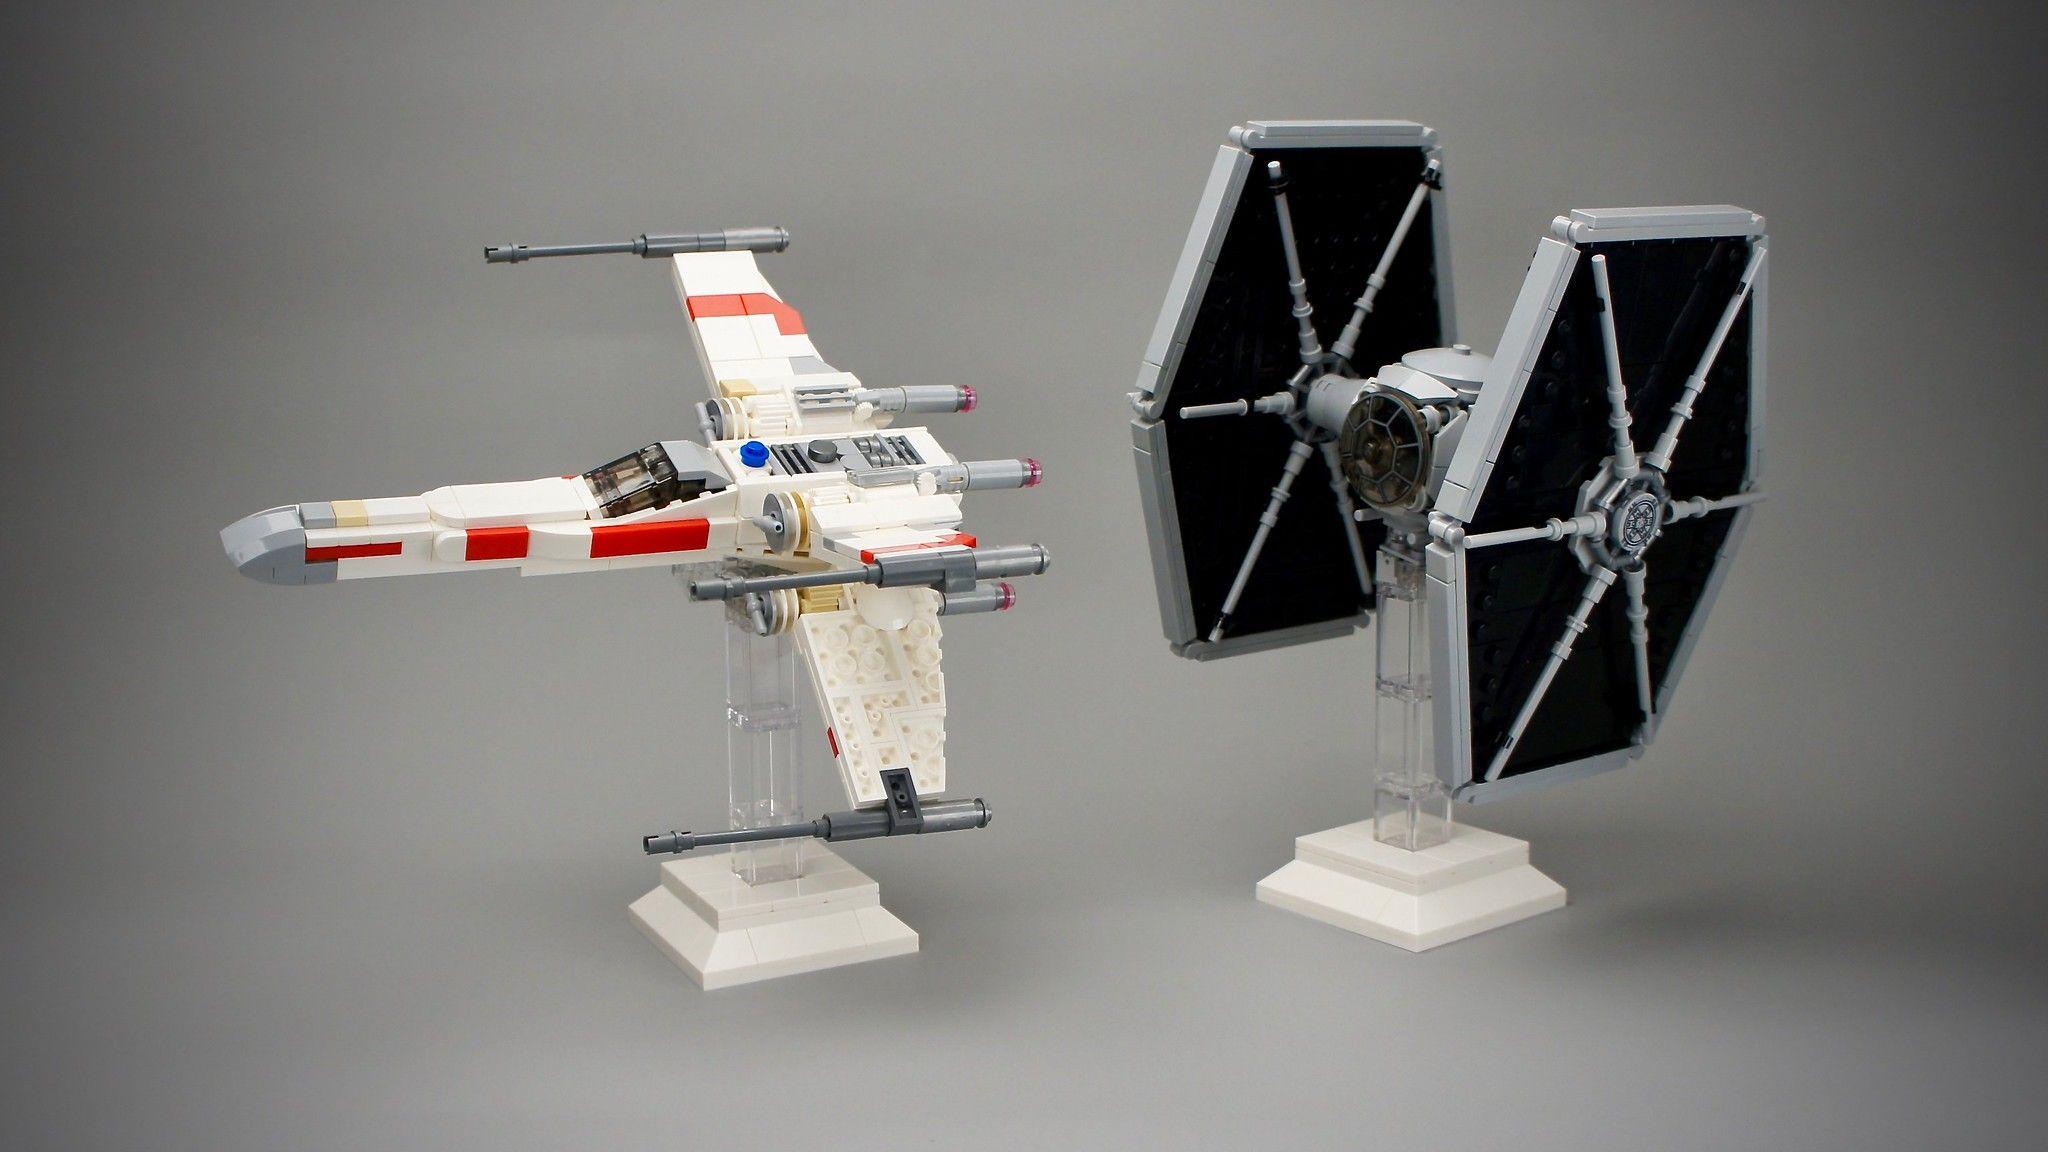 X Wing Tie Fighter Midi Scale Lego Army Lego Tie Fighter Lego Star Wars